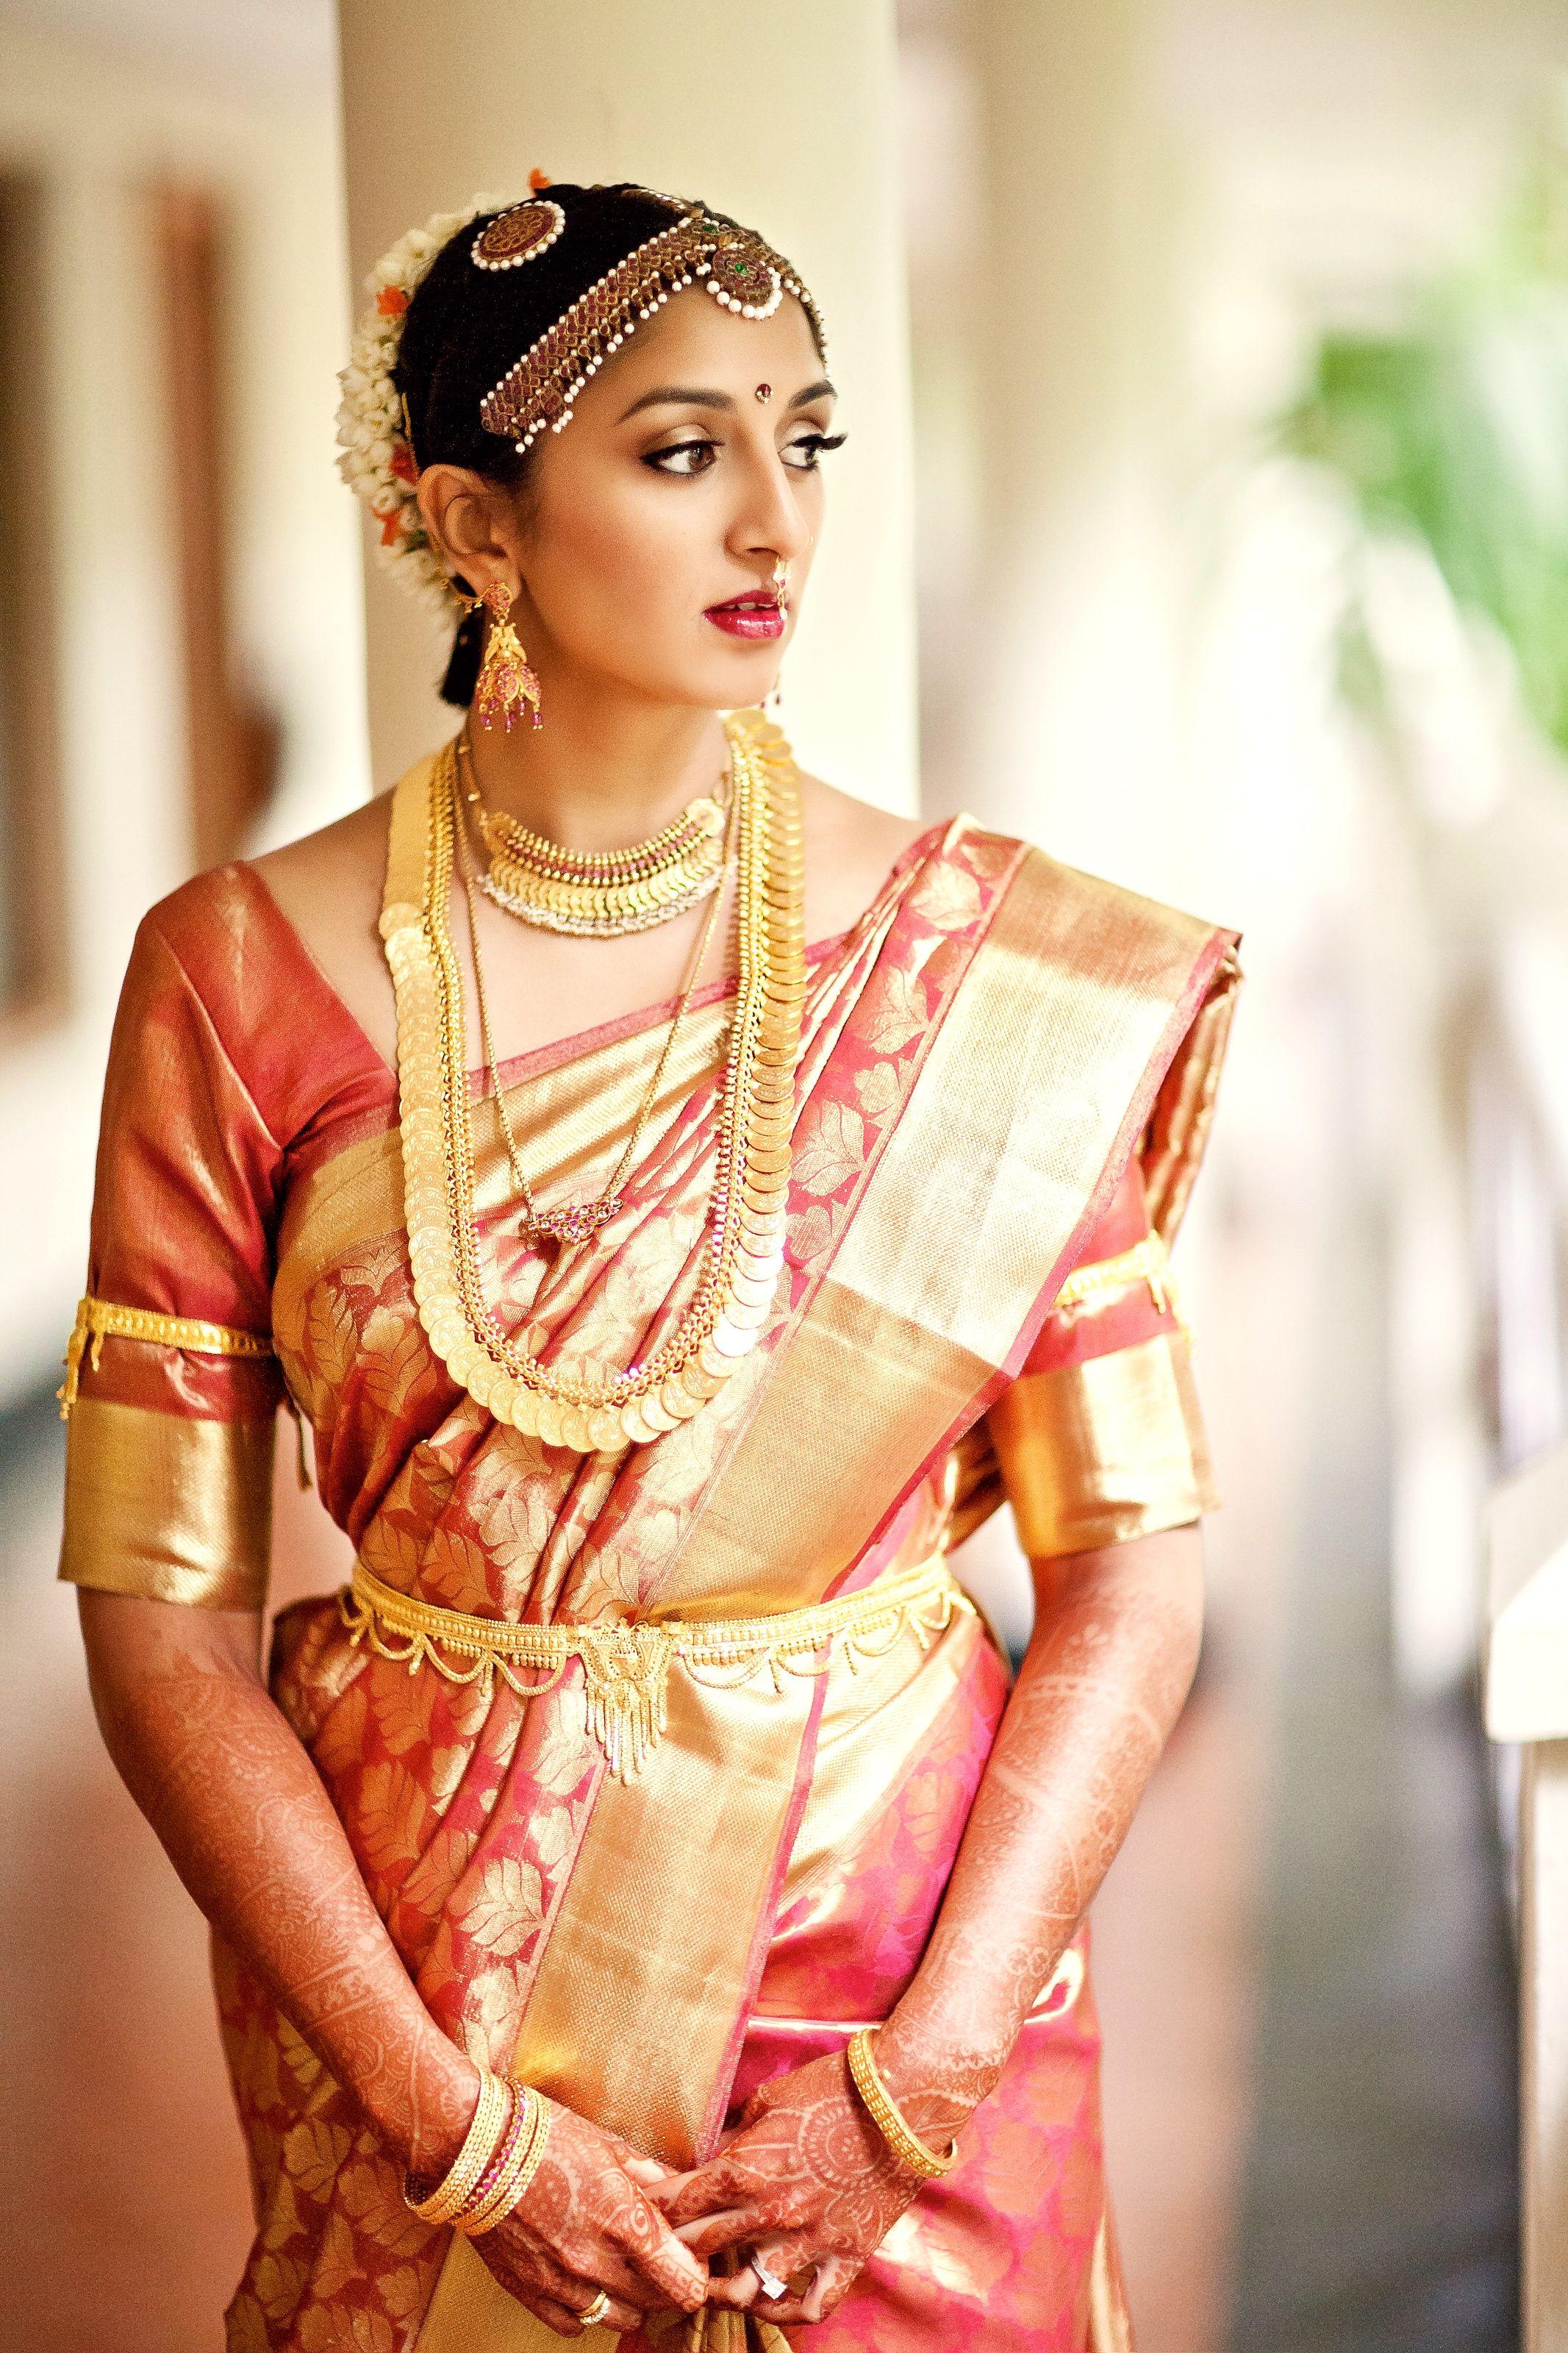 Elegant Bride In Pink Kanjivaram Saree And Temple